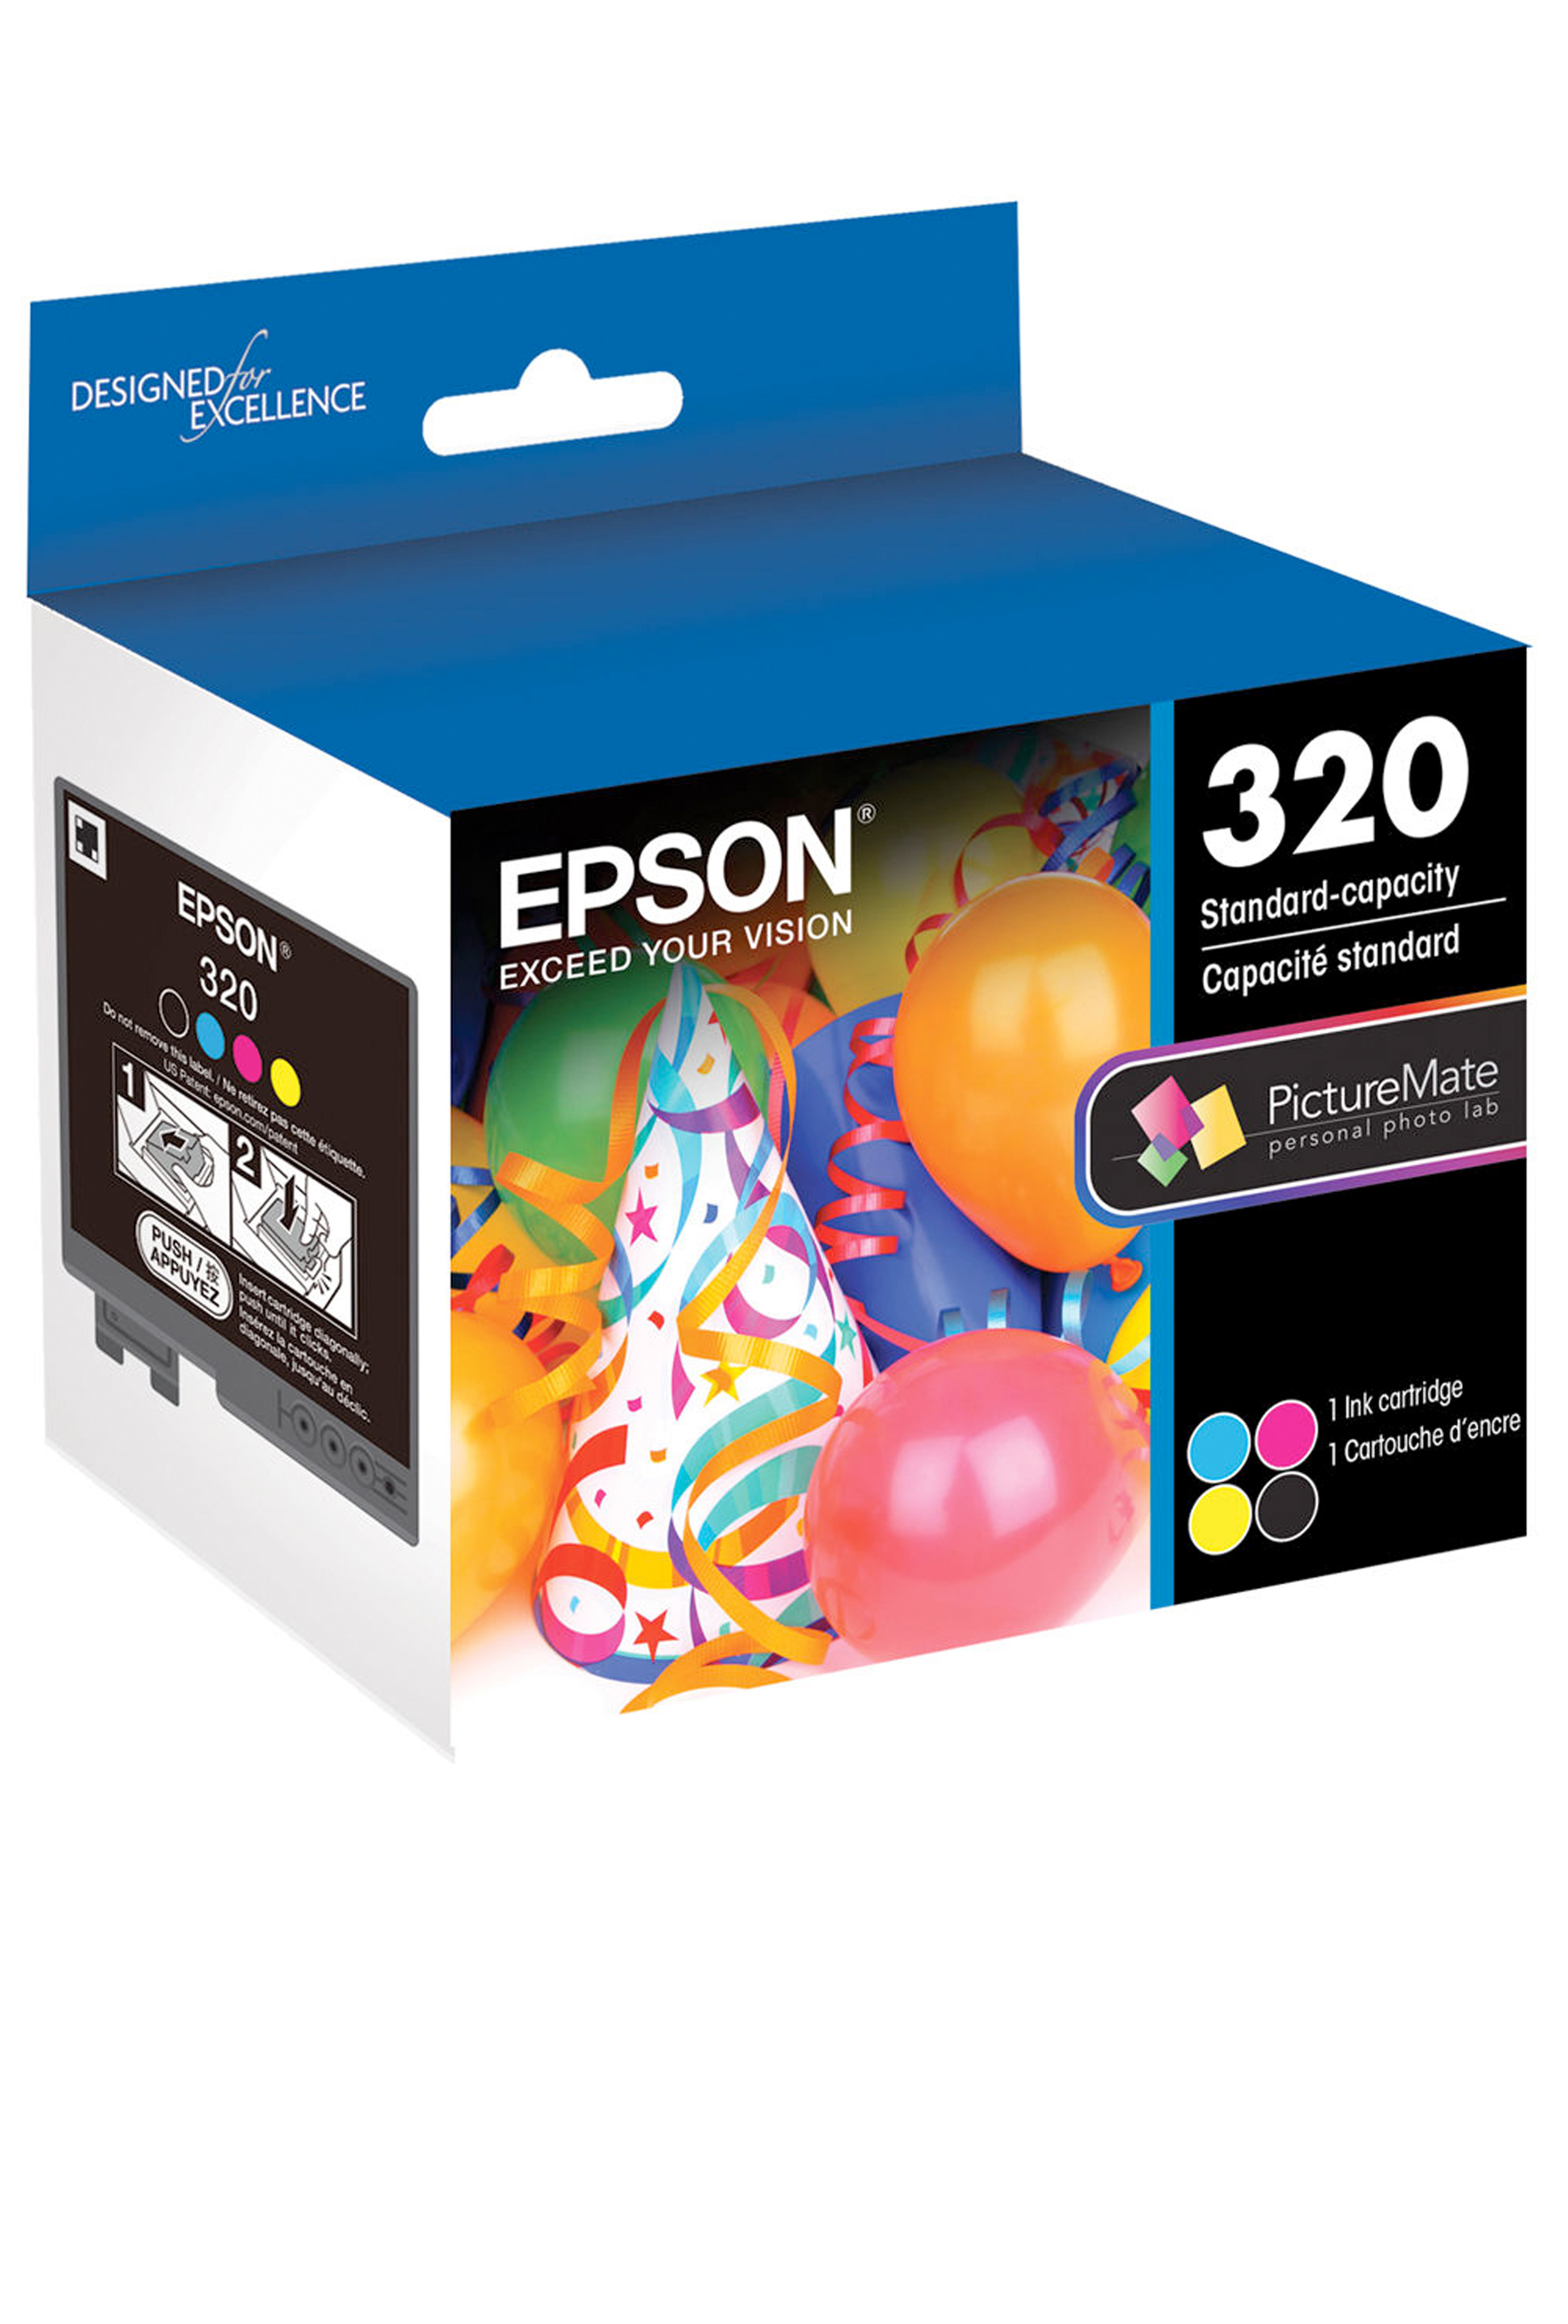 Epson Picturemate 400 Series Photo Cartridge T320